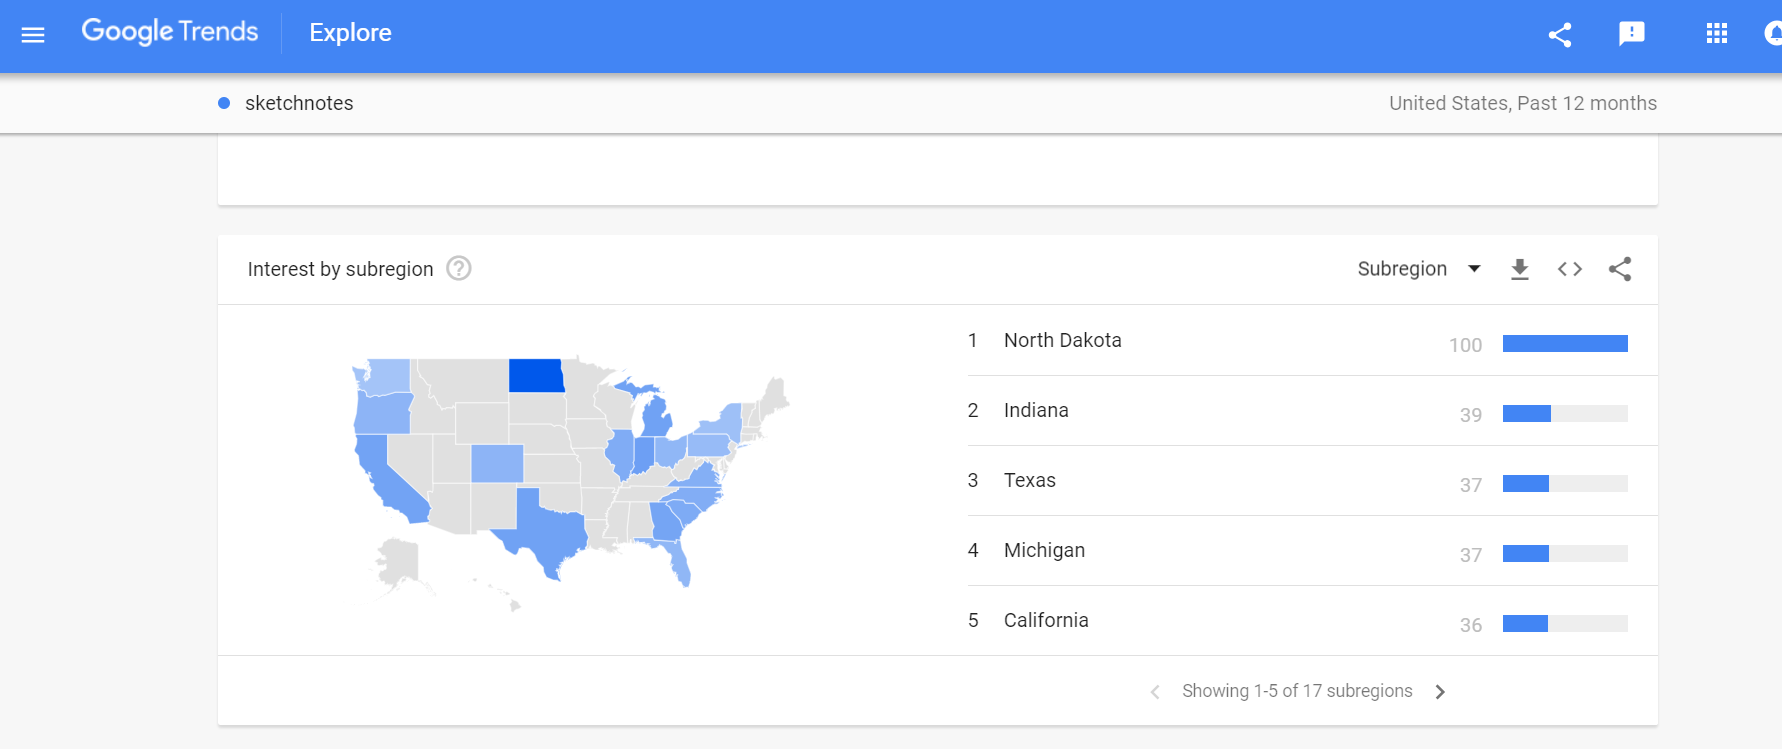 People in north Dakota really like sketchnotes